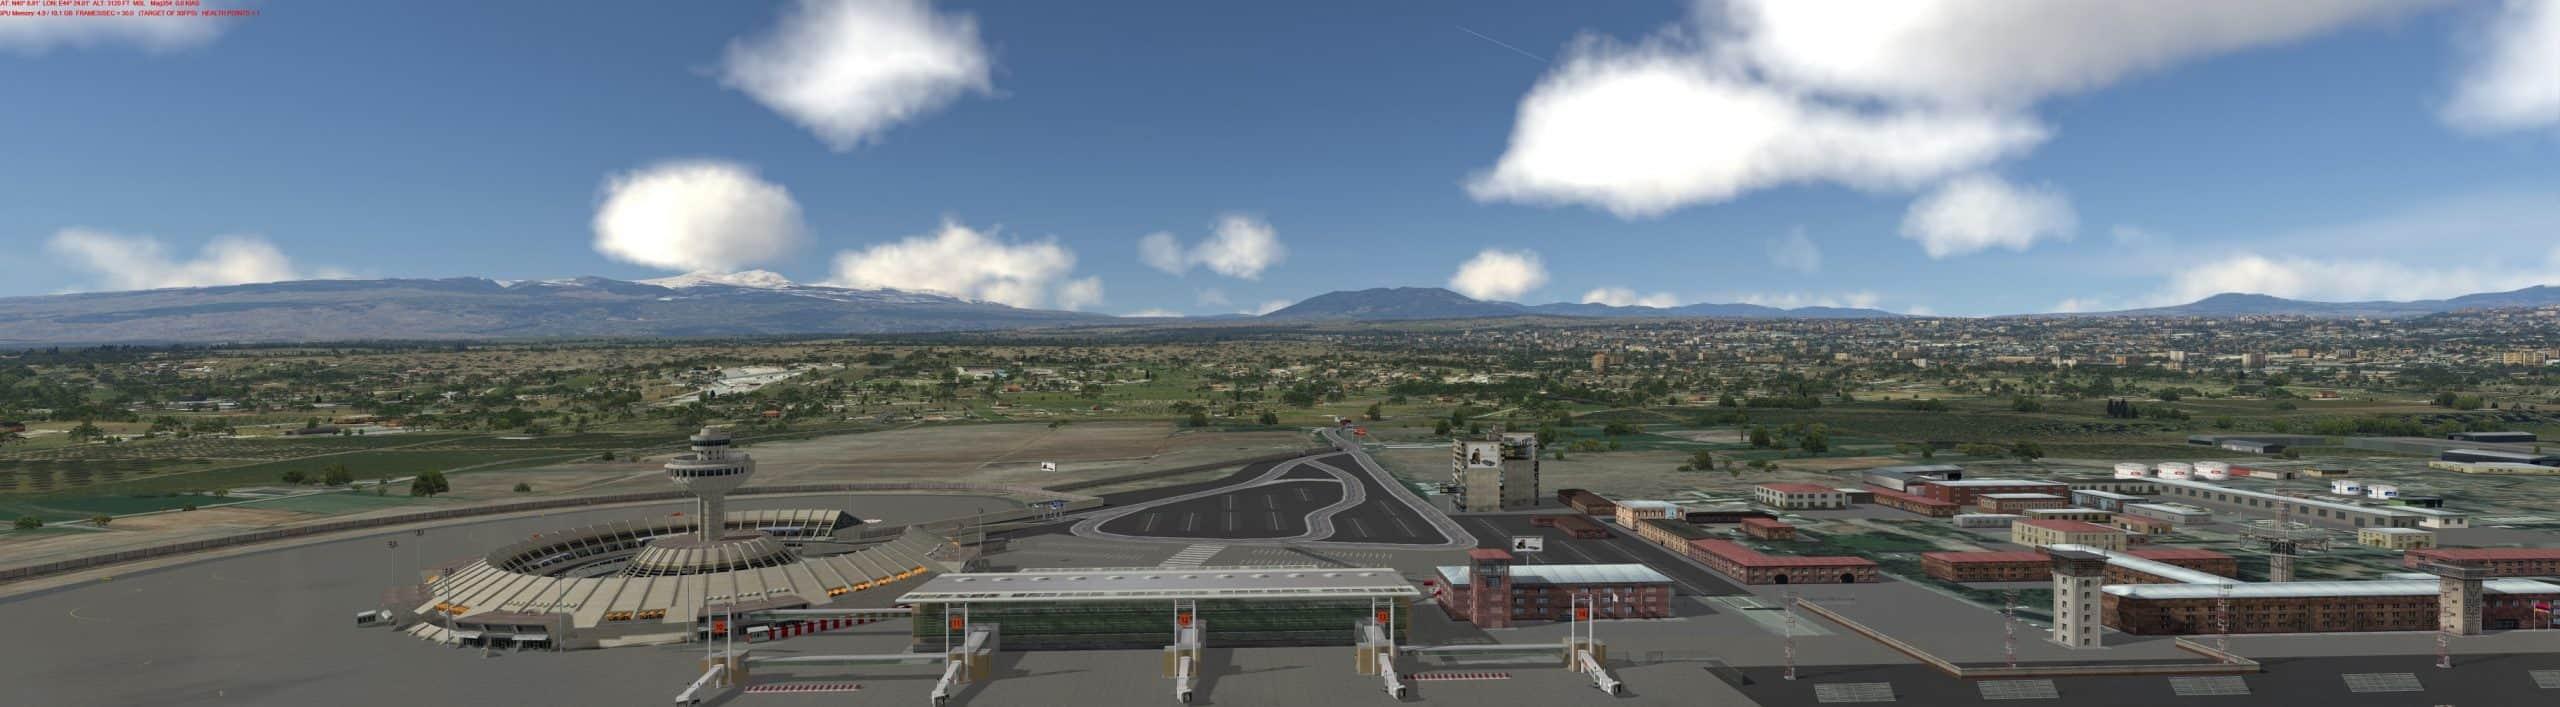 Jerewan-TM1-scaled.jpg